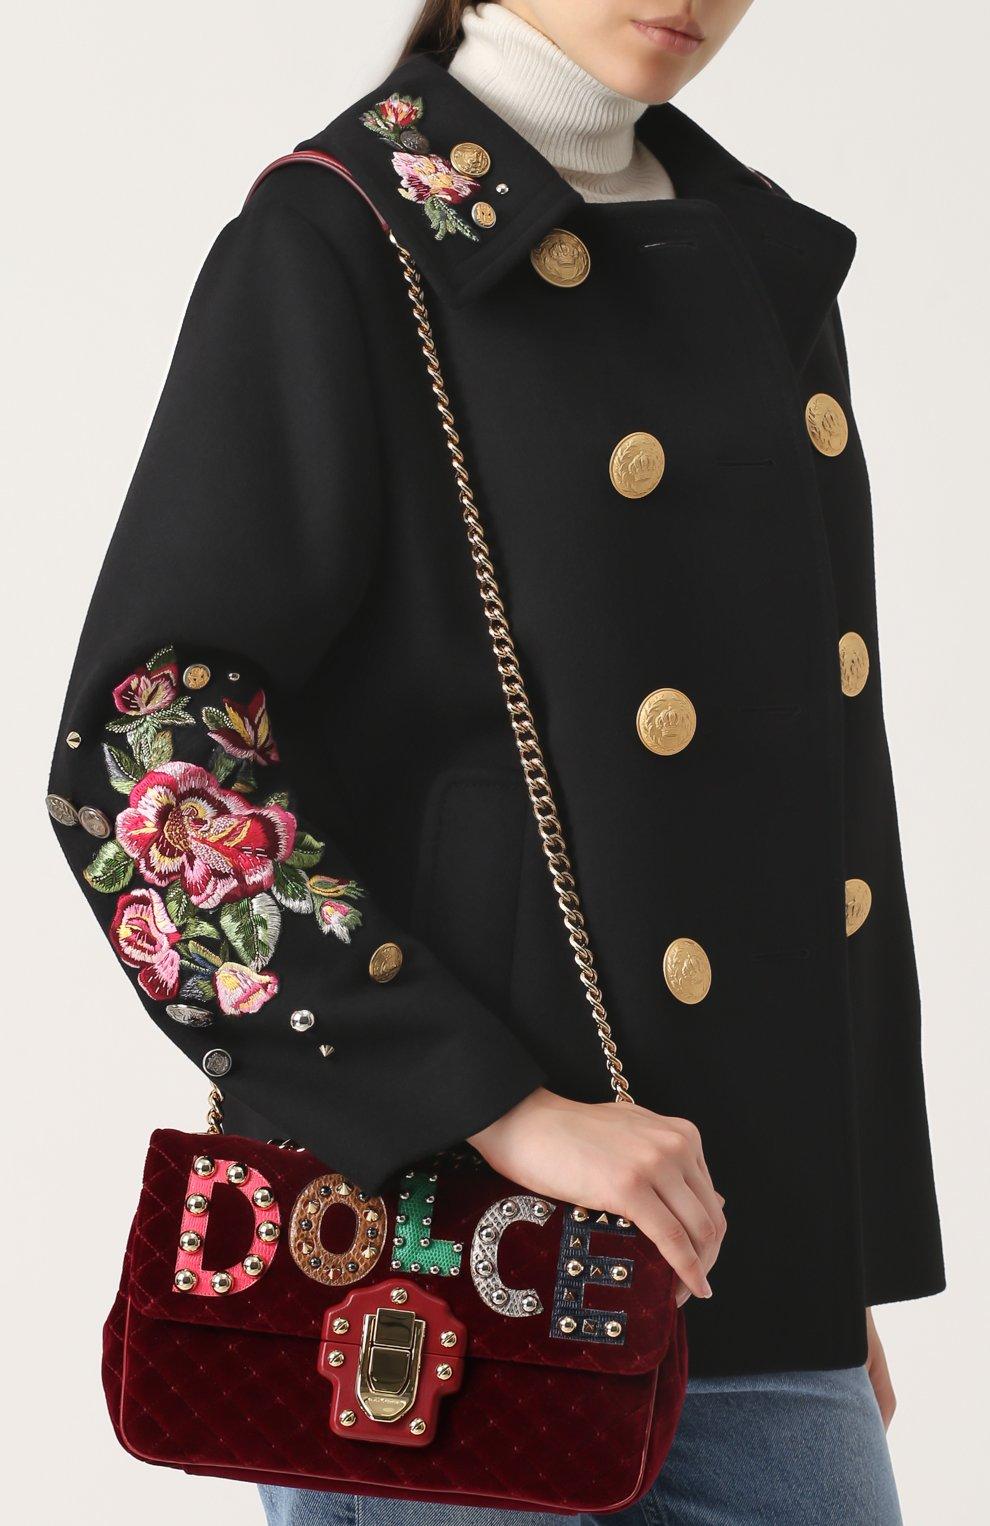 Сумка Lucia с аппликациями Dolce & Gabbana бордовая цвета   Фото №5